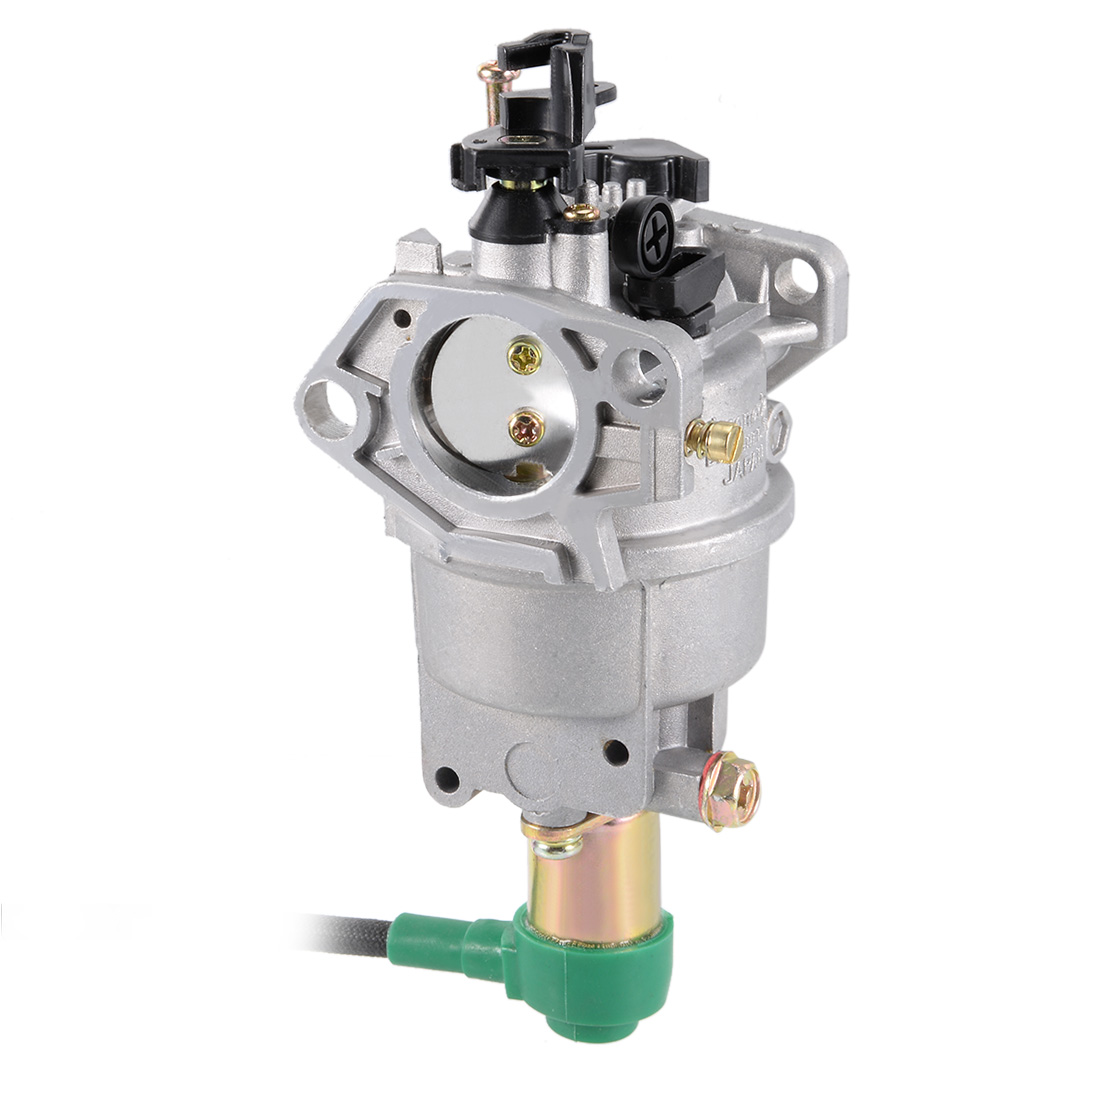 Carburetor Carb Harbor Freight Predator 68525 8750 Watts 13hp 420cc Generator